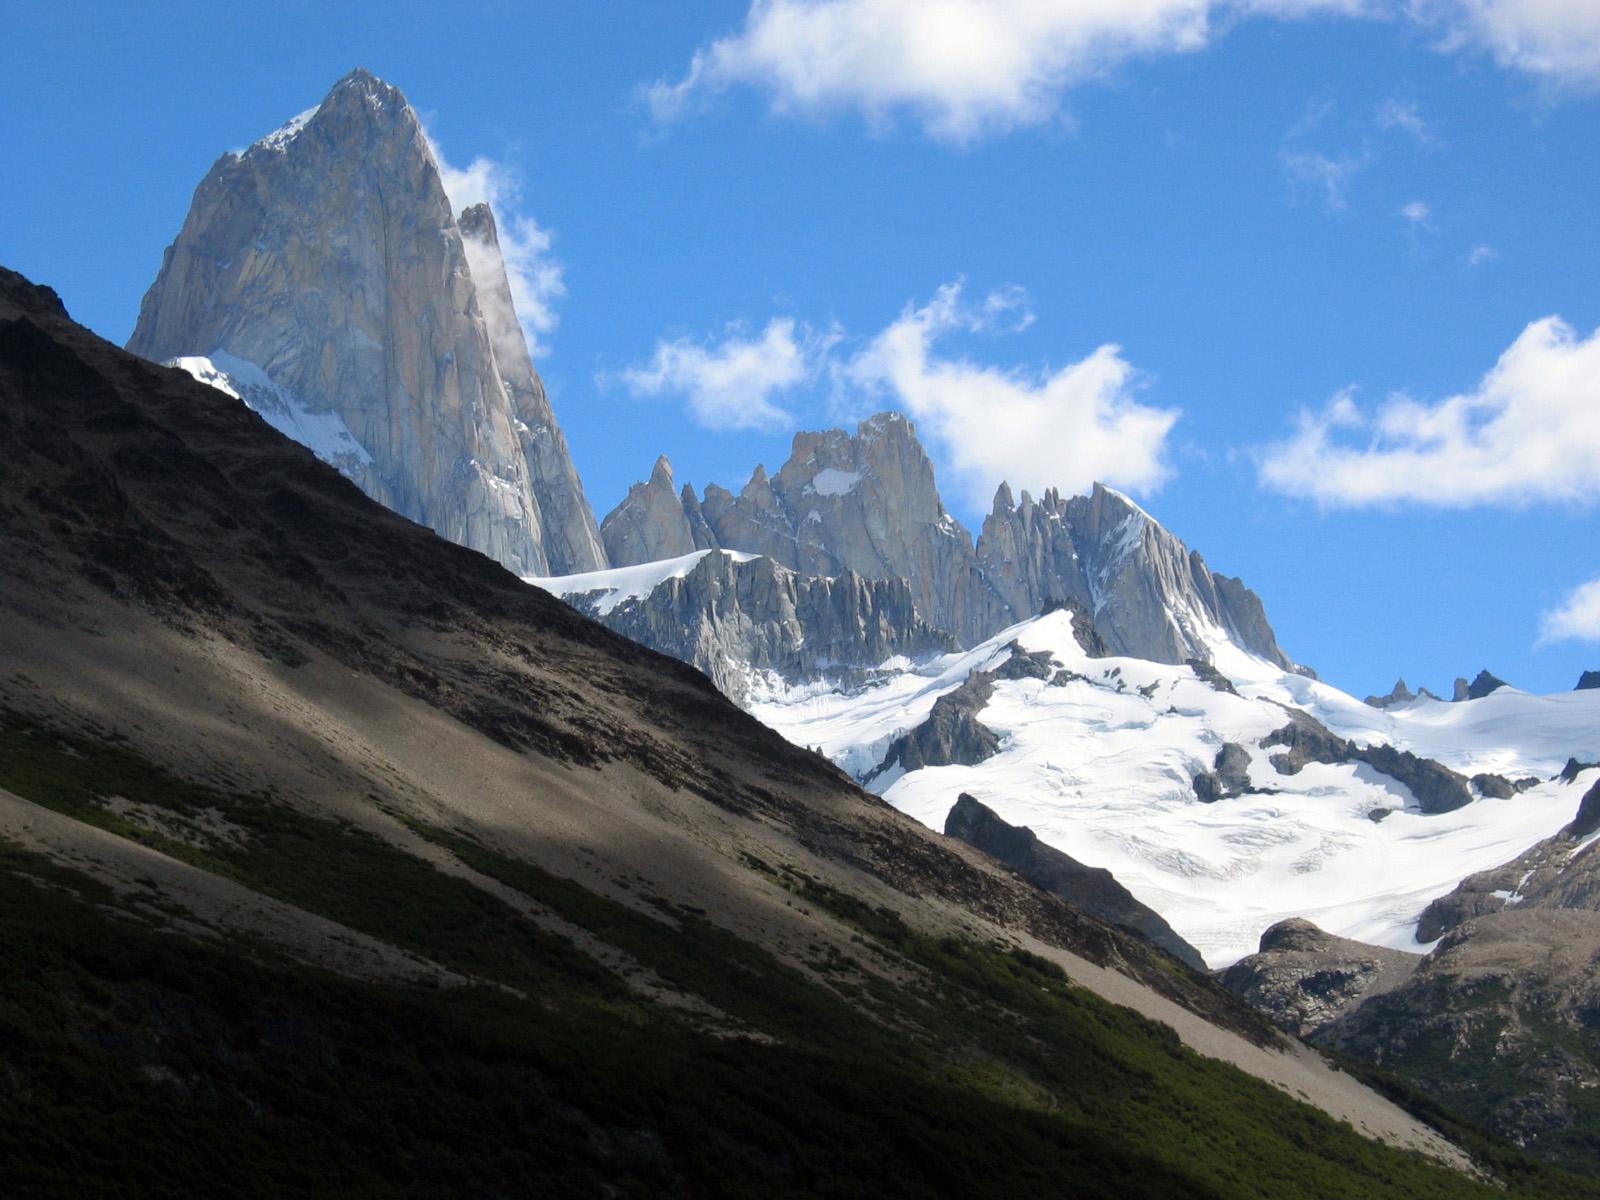 World Of Wallpapers: Amazing Mountain